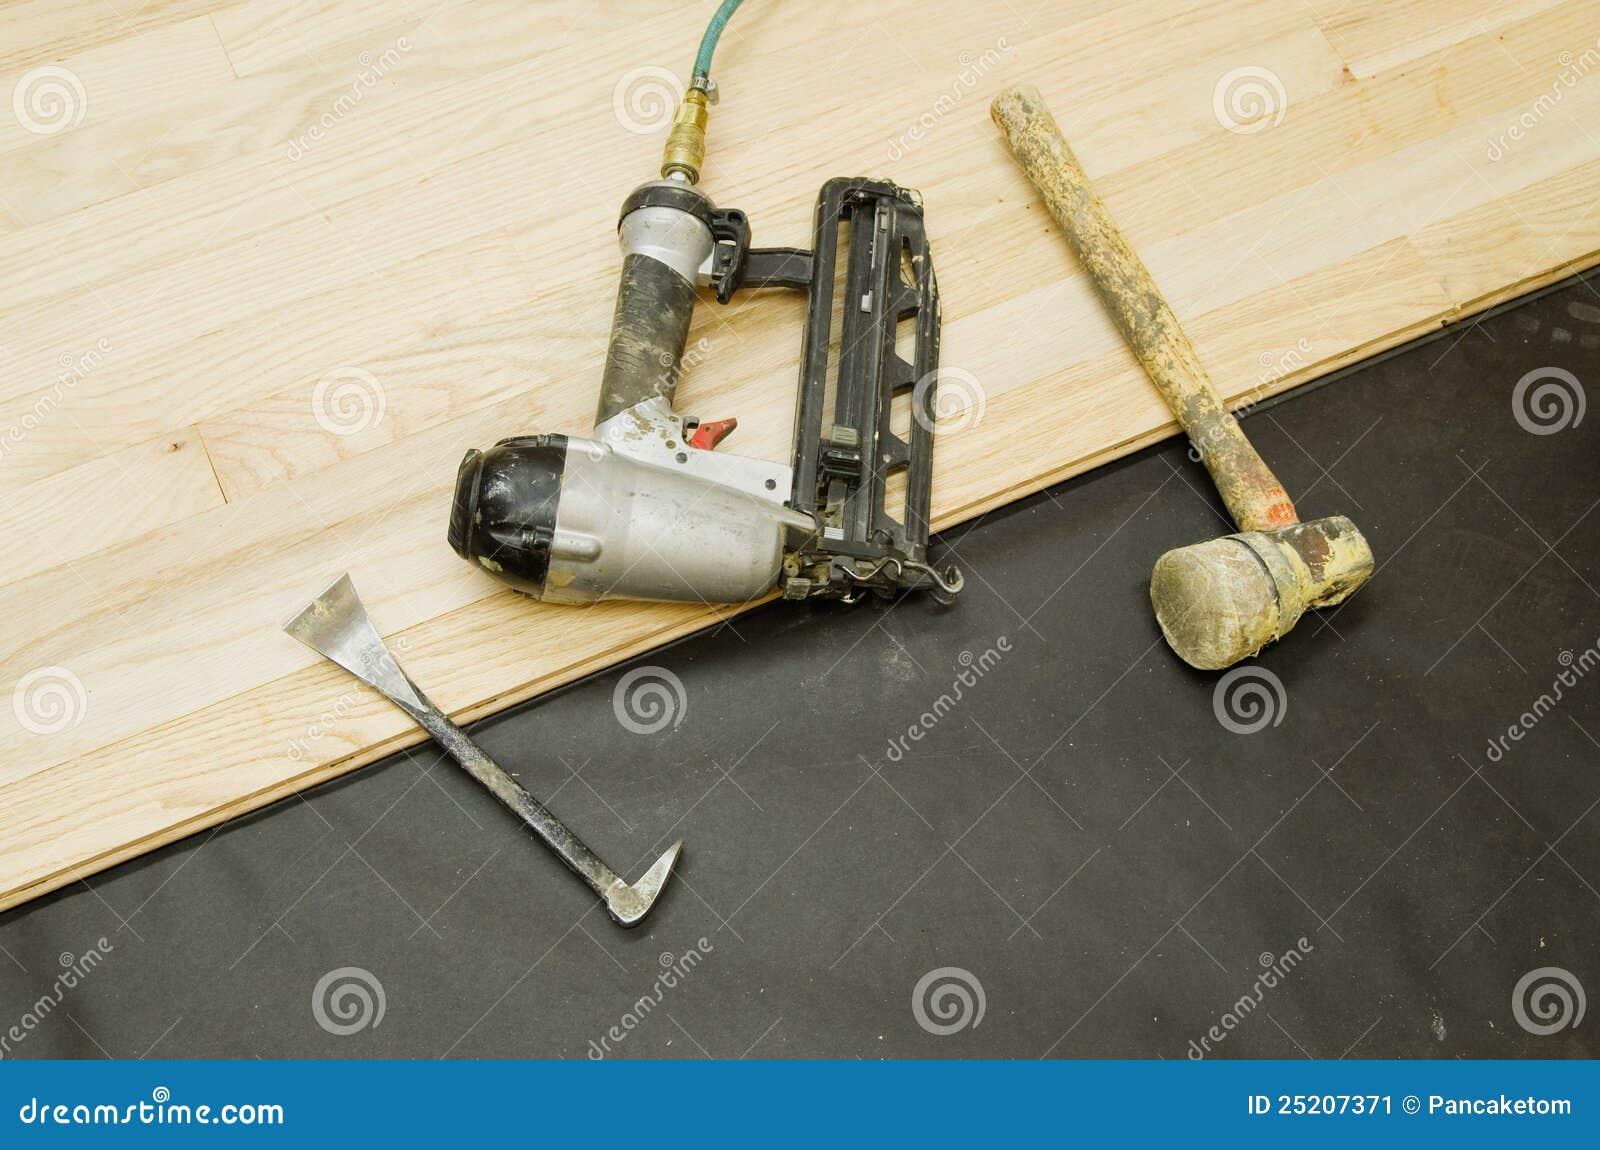 floor flooring hardwood installation tools ... - Hardwood Flooring Tools Stock Image - Image: 25207371